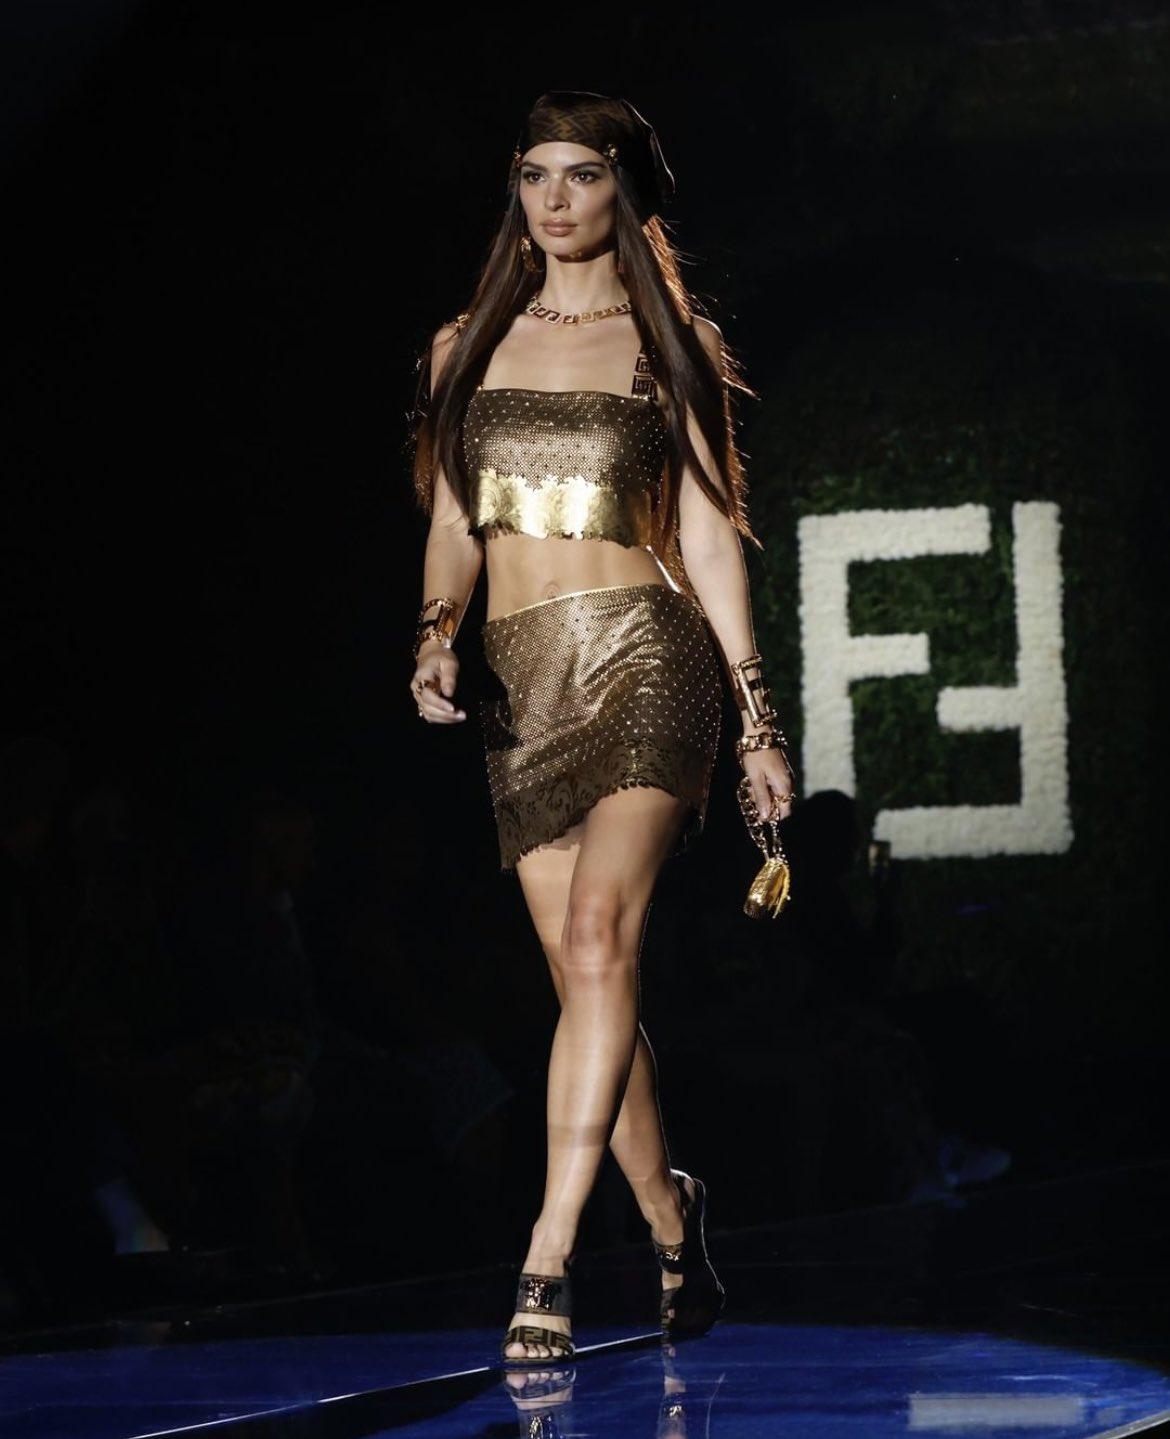 Emily - Versace x Fendi - FENDACE Collection